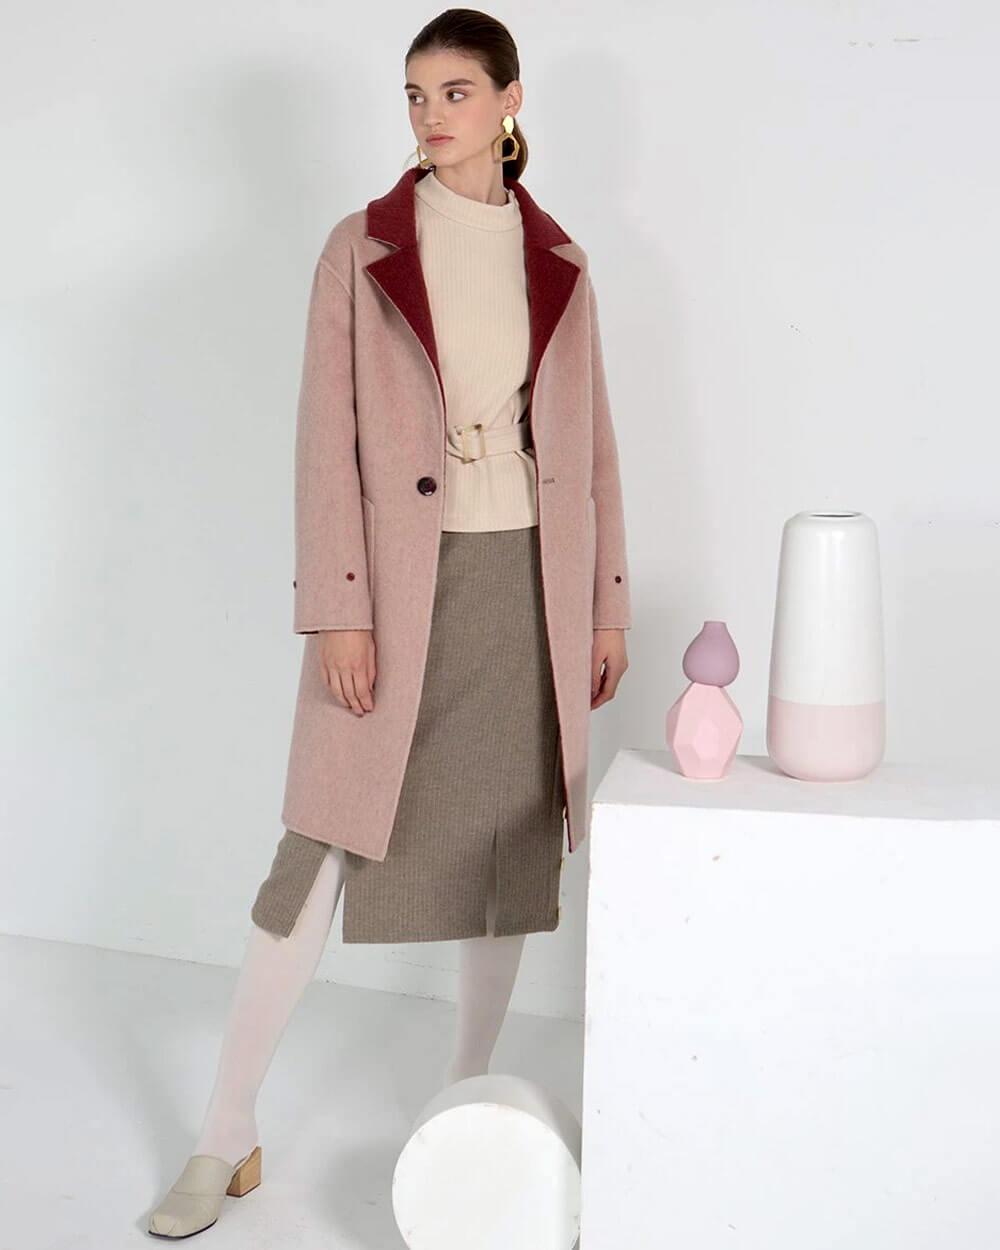 Petite Studio sustainable clothing